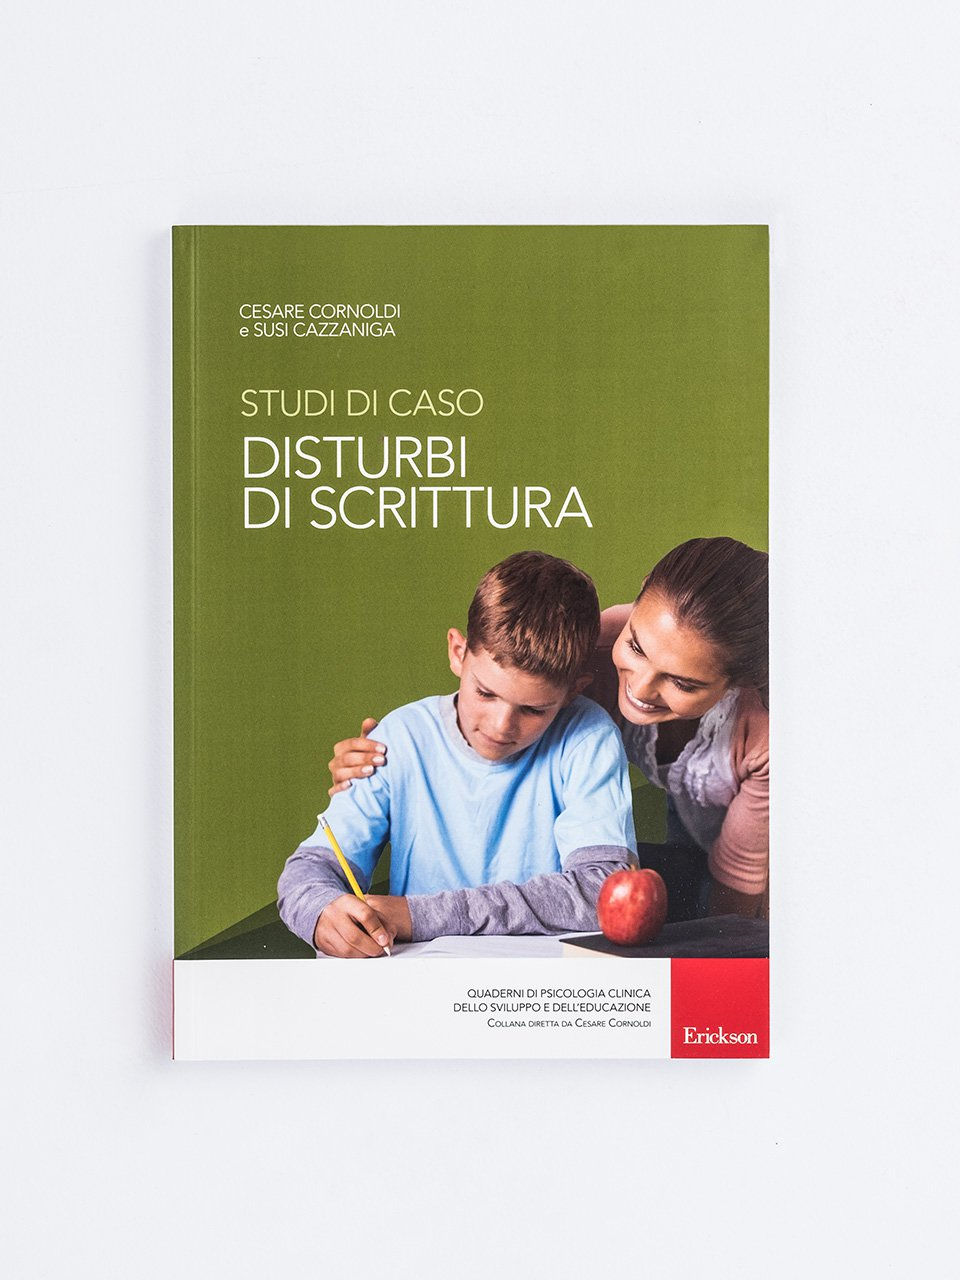 Studi di caso - Disturbi di scrittura - Competenze e valutazione metodologica - Libri - Erickson